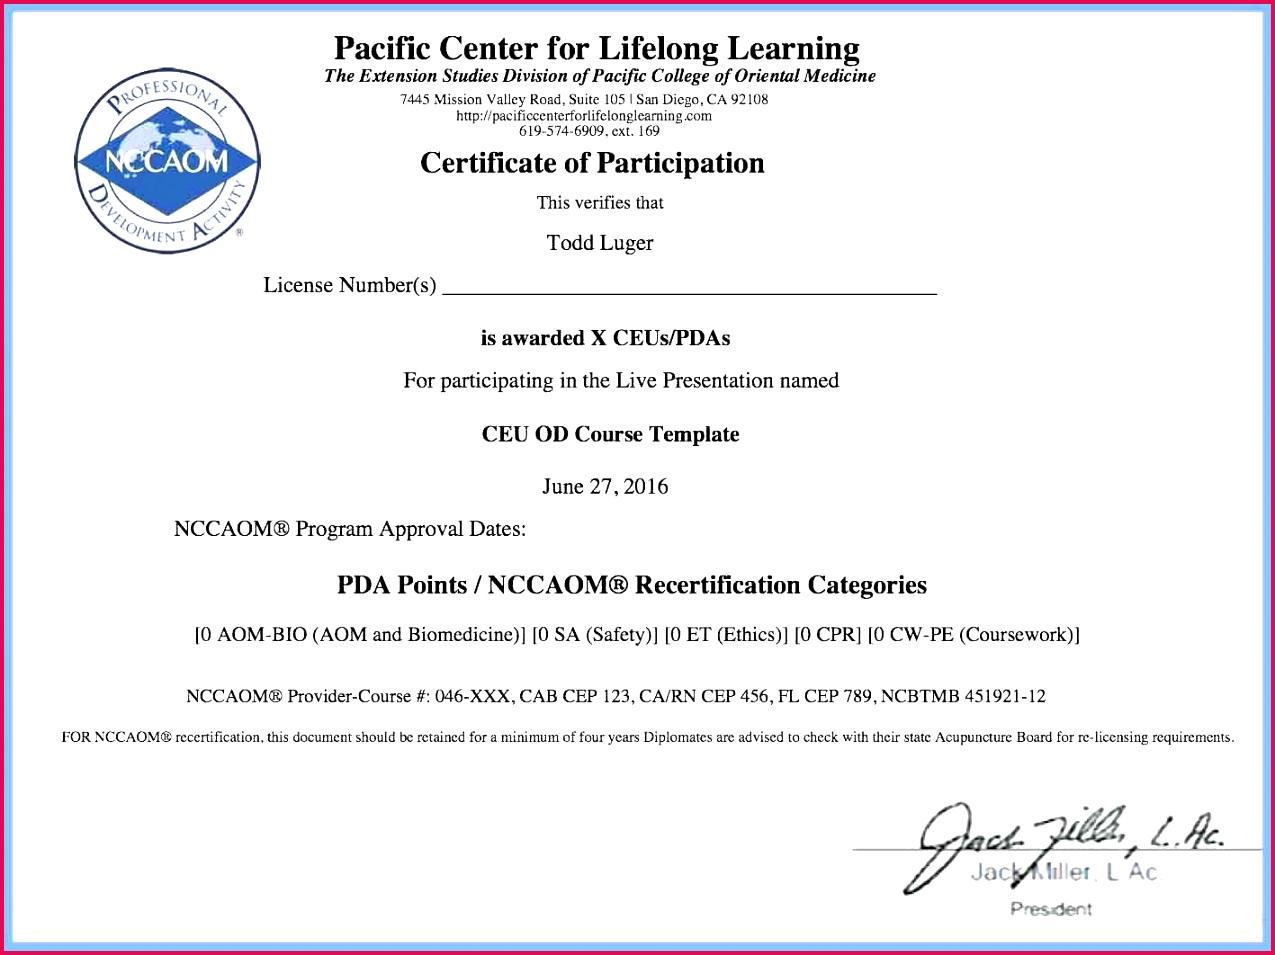 certificate of data destruction template elegant hard drive destruction certificate template luxury certificate data destruction template new of certificate of data destruction template